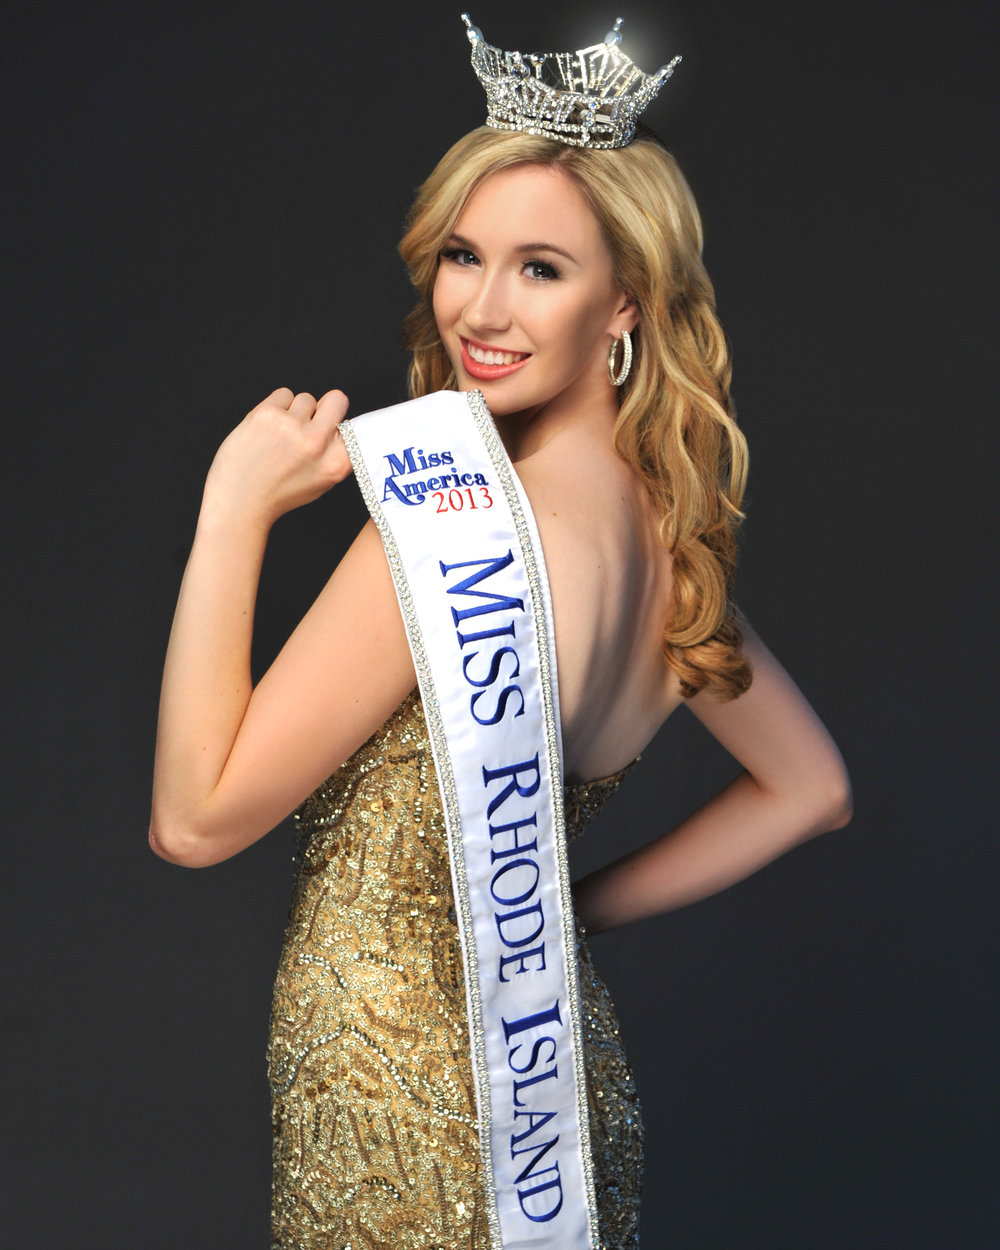 Jesica Marfeo Miss Rhode Island 2013 Quality of Life Finalist